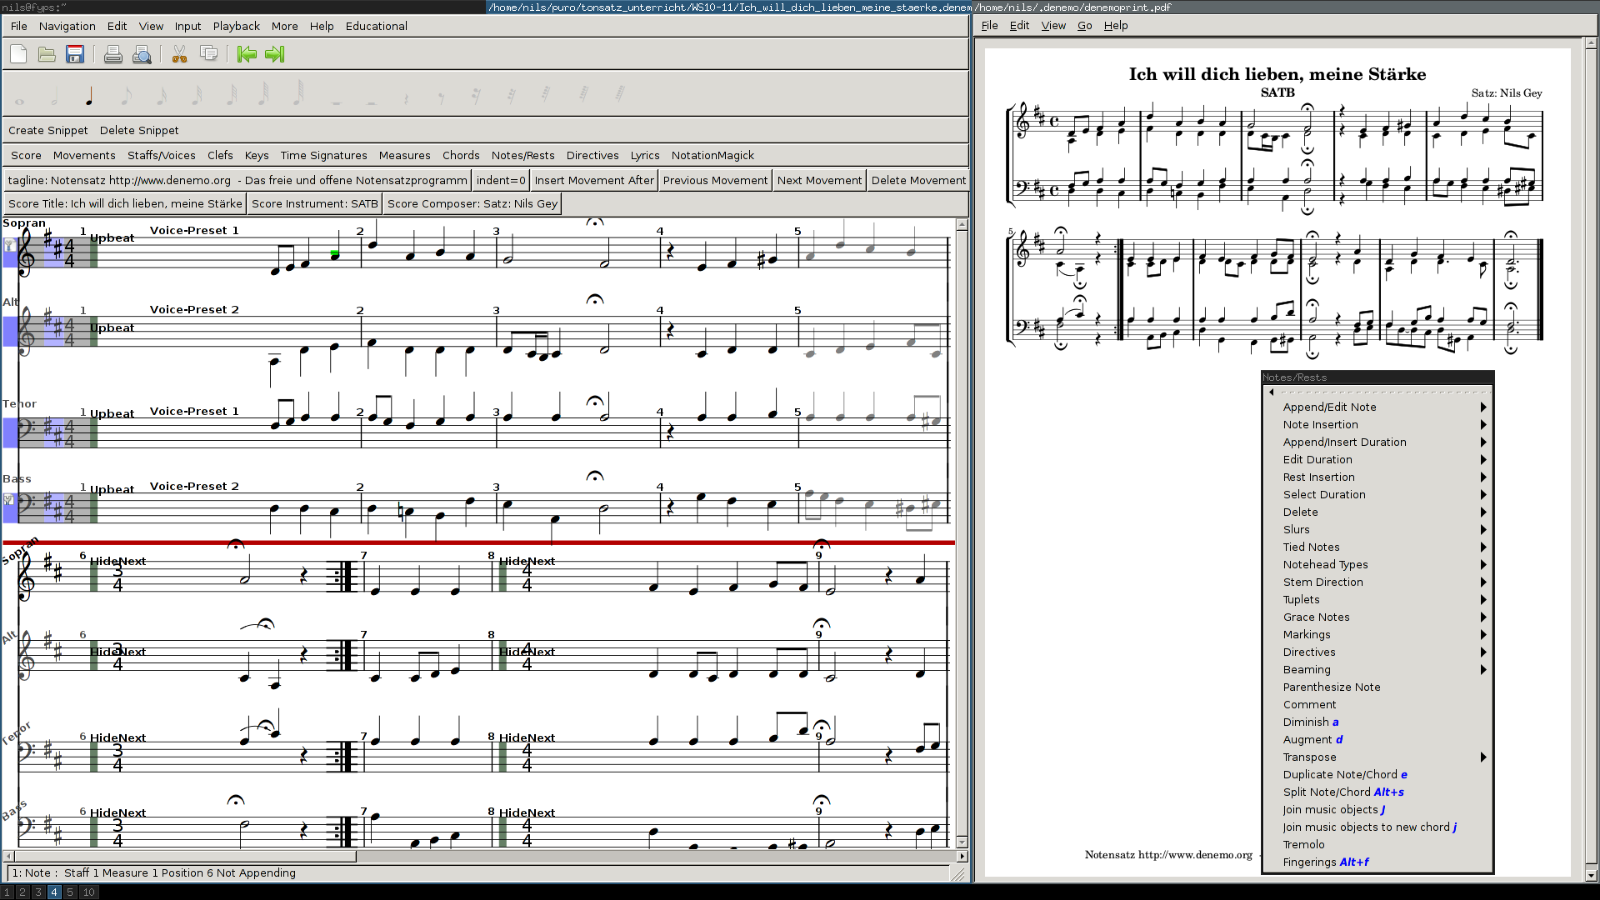 Denemo (Scorewriter and Music Sequencer Software) Windows/Mac USB